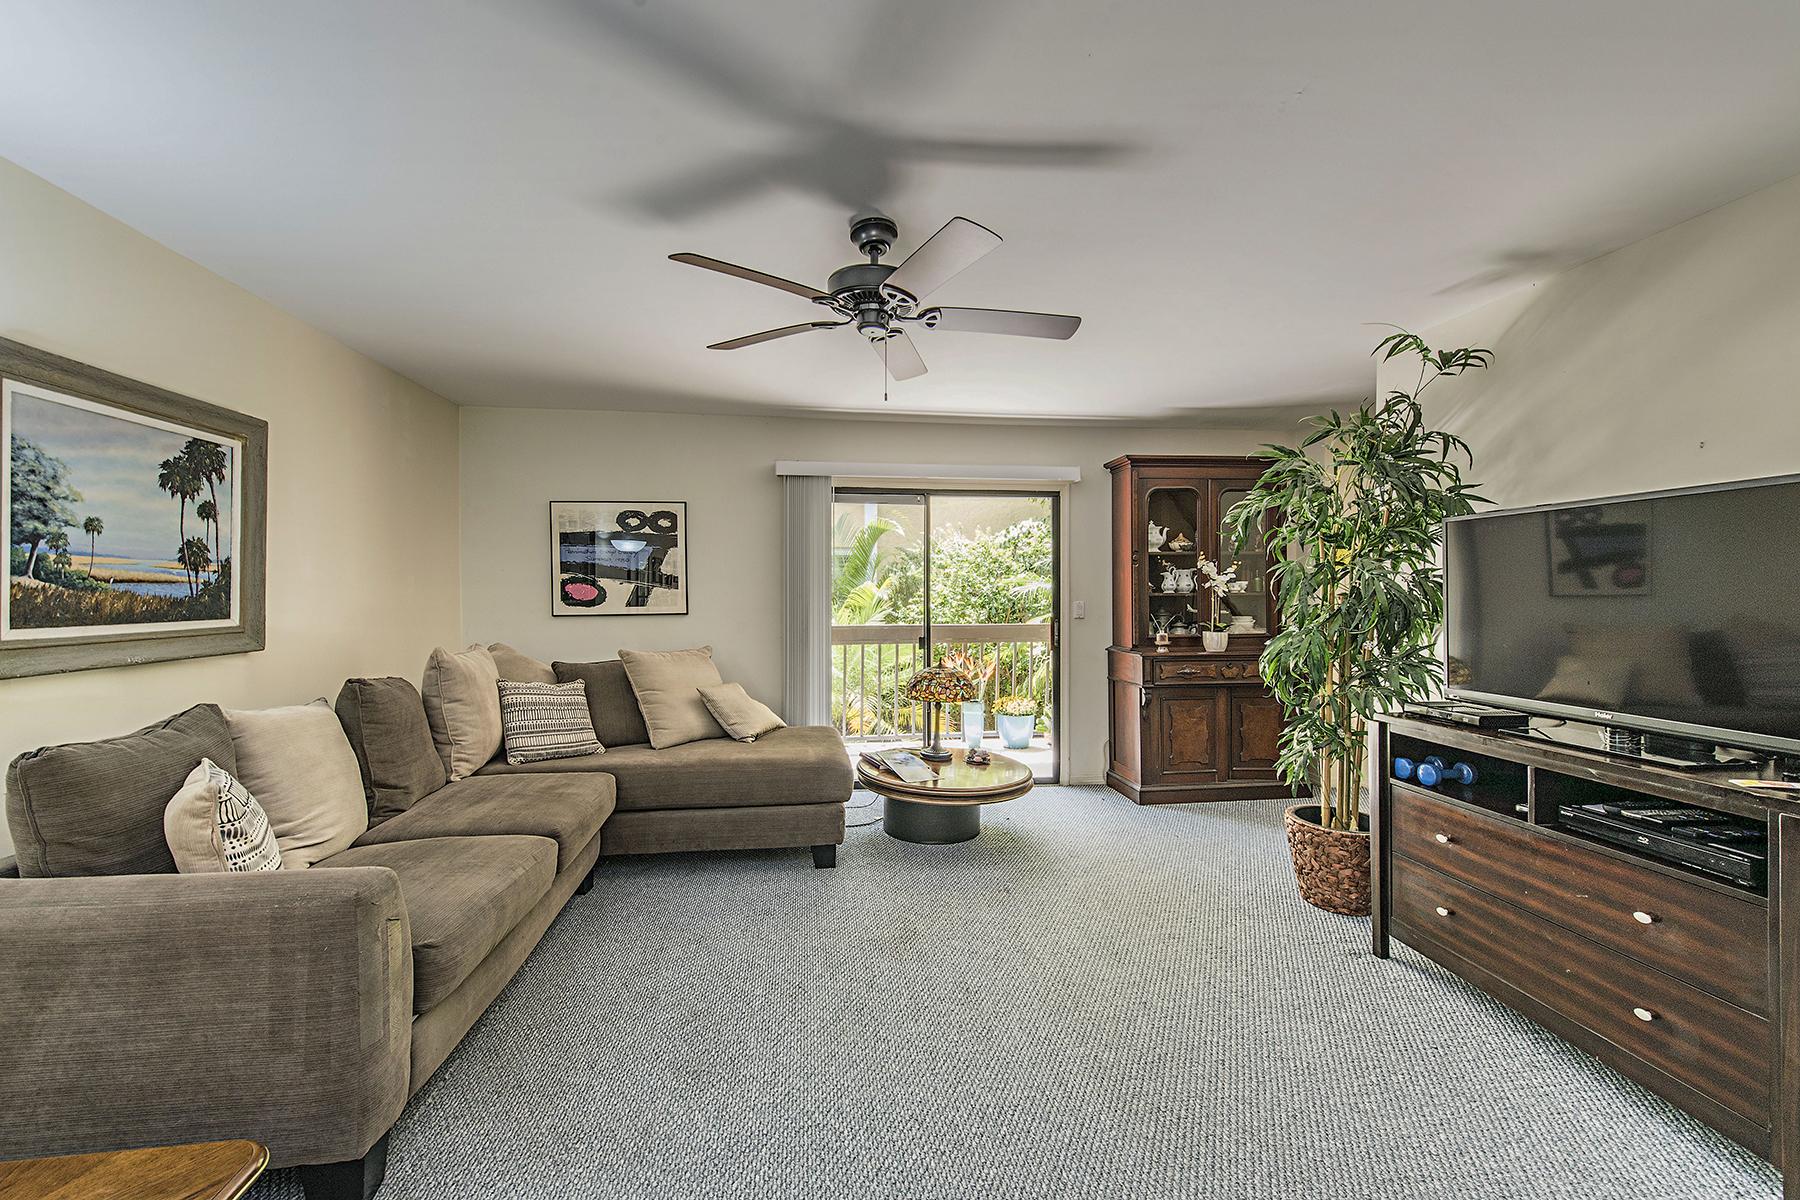 Condominium for Sale at OLD NAPLES - NAPLES MARINA VILLAS 995 9th Ave S 4, Naples, Florida 34102 United States